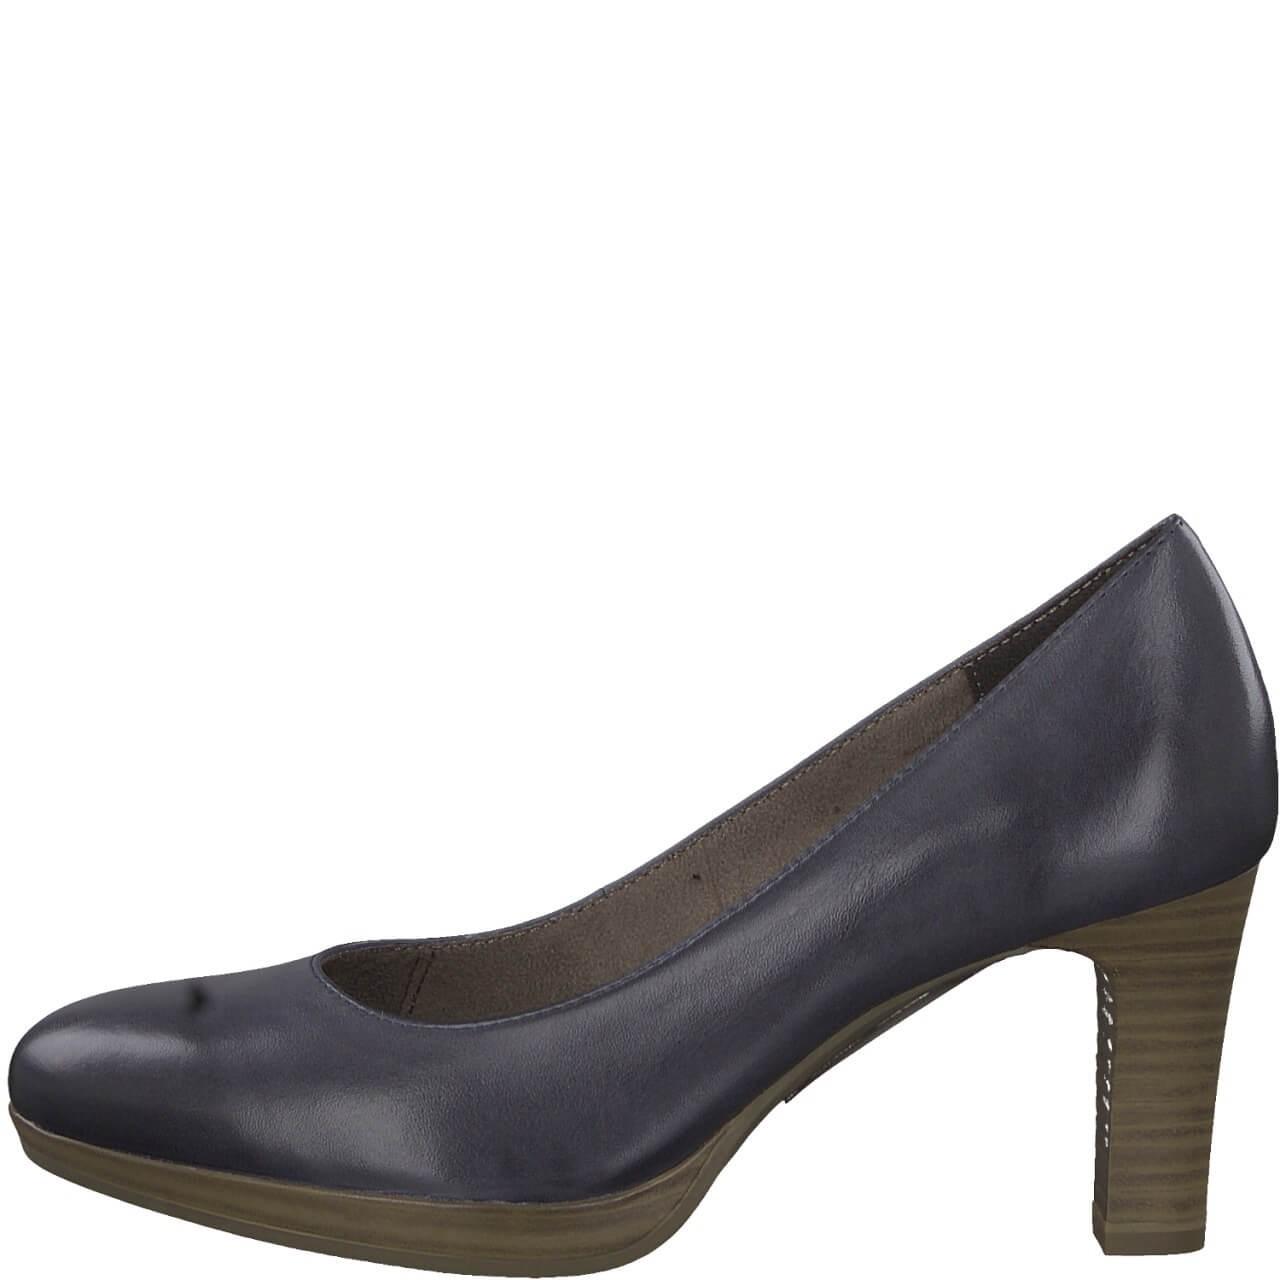 Navy Pumps for Women | Tamaris Shoes | Online Italian Store